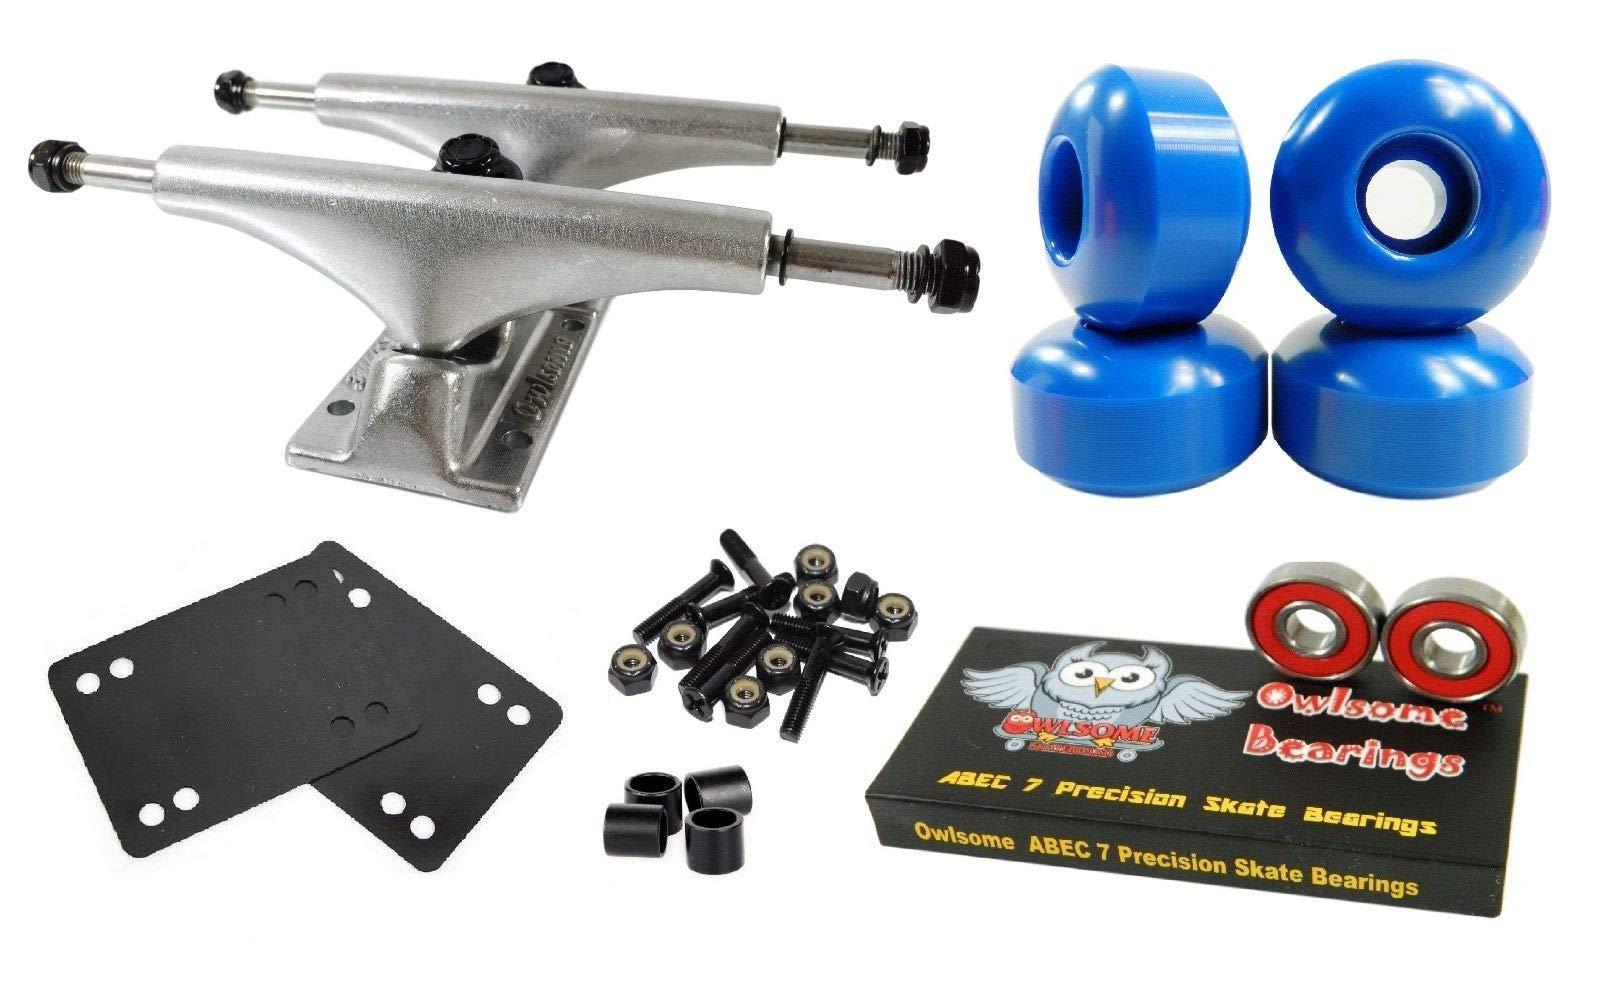 Blue 5.25 Polished Skateboard Trucks + 52Mm Wheels + ABEC 7 Bearings Combo